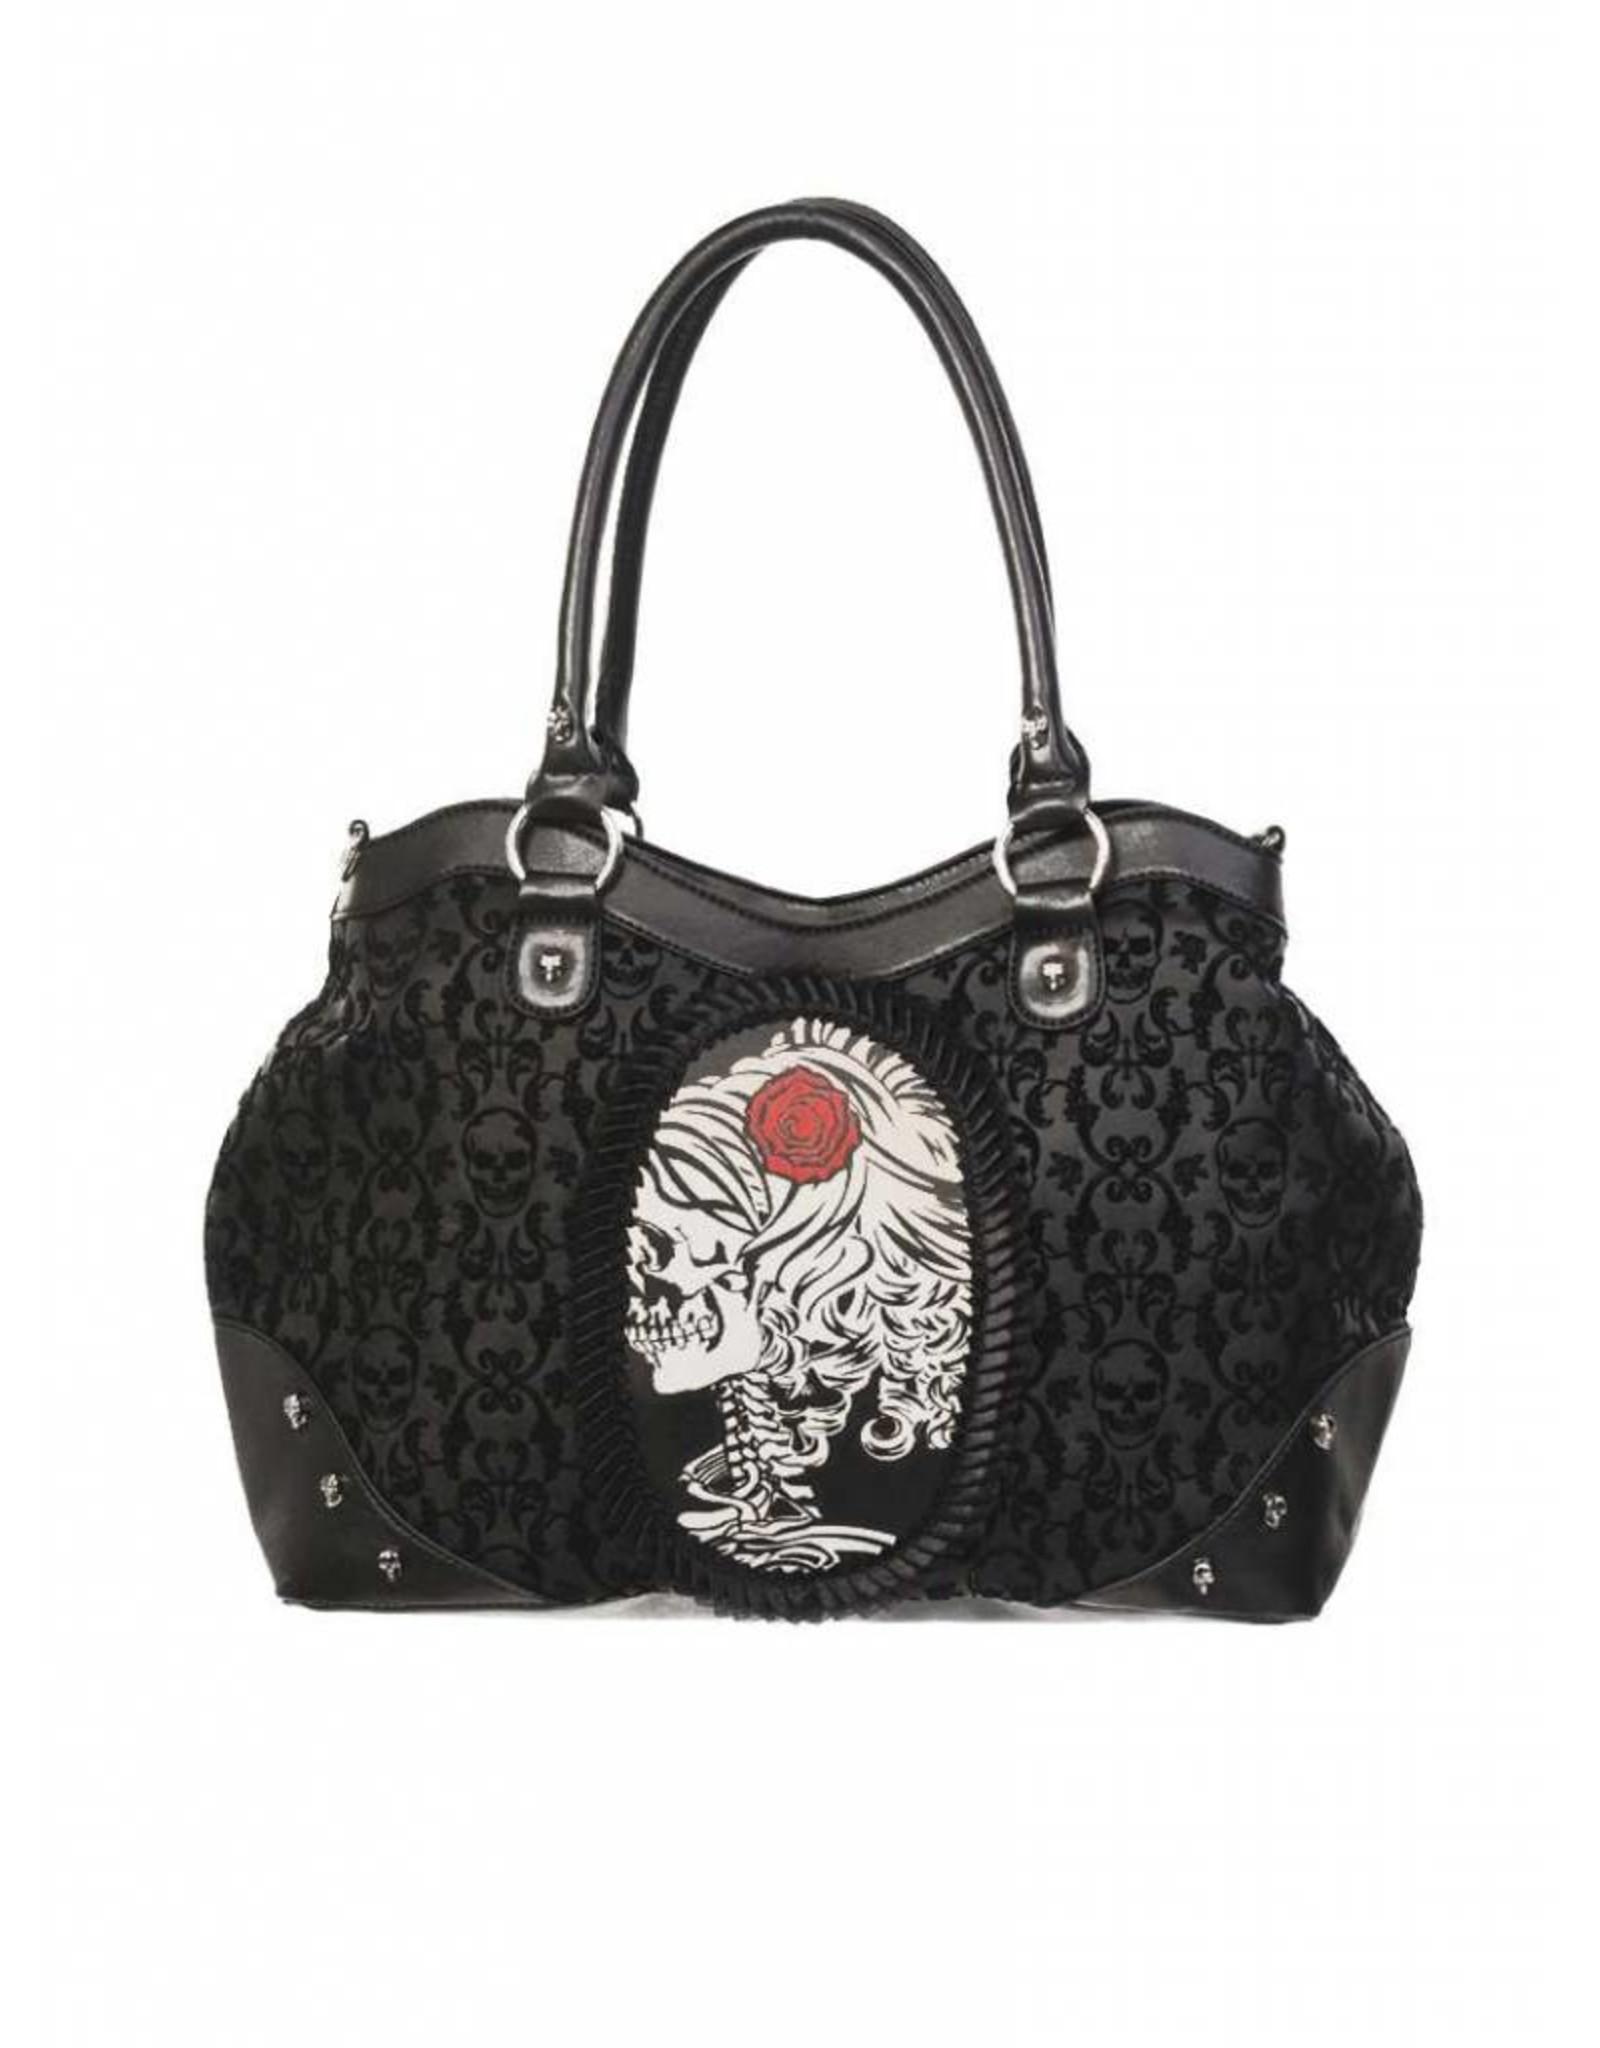 BANNED - Cameo Lady Rose Handbag